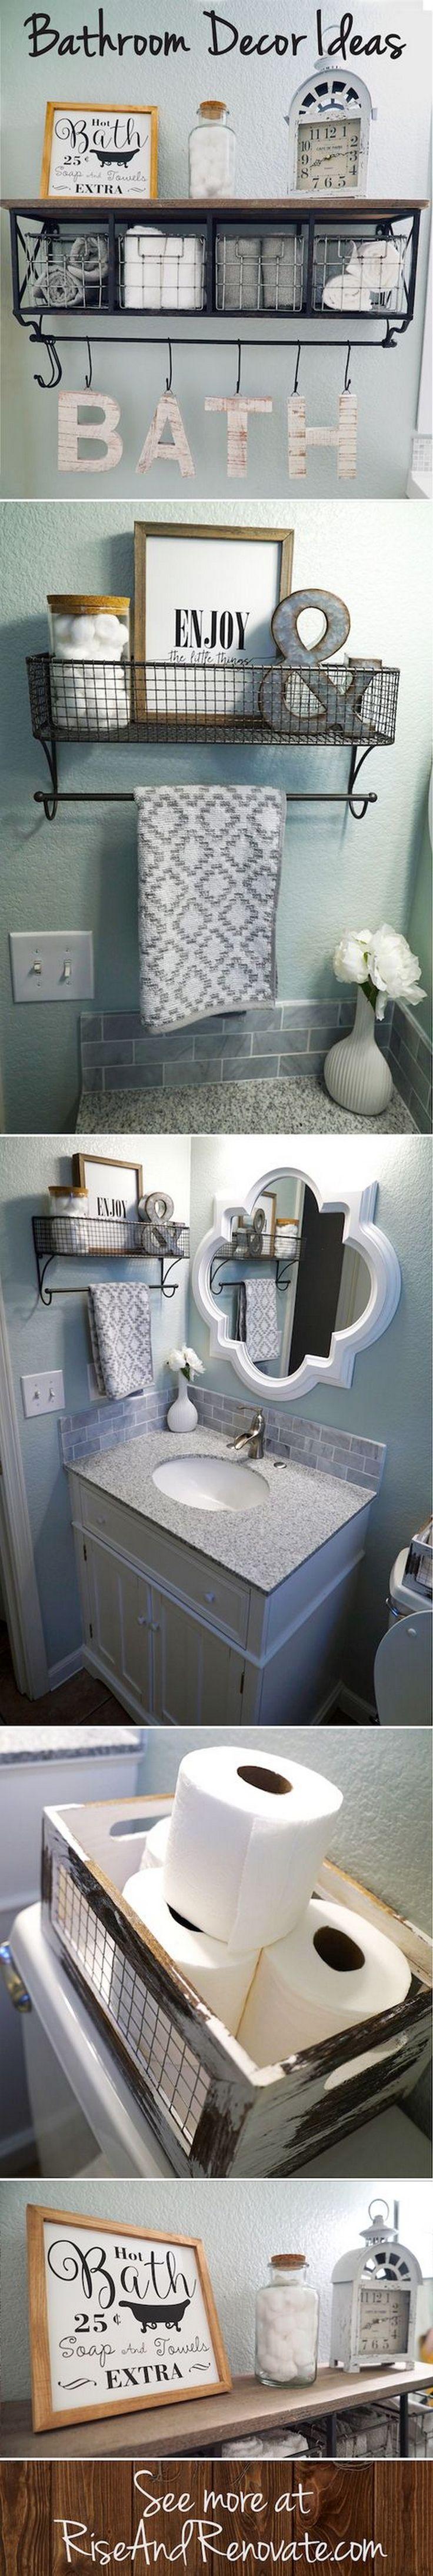 Does coffee help you go to the bathroom - 99 Modern Rustic Master Bathroom Design Ideas